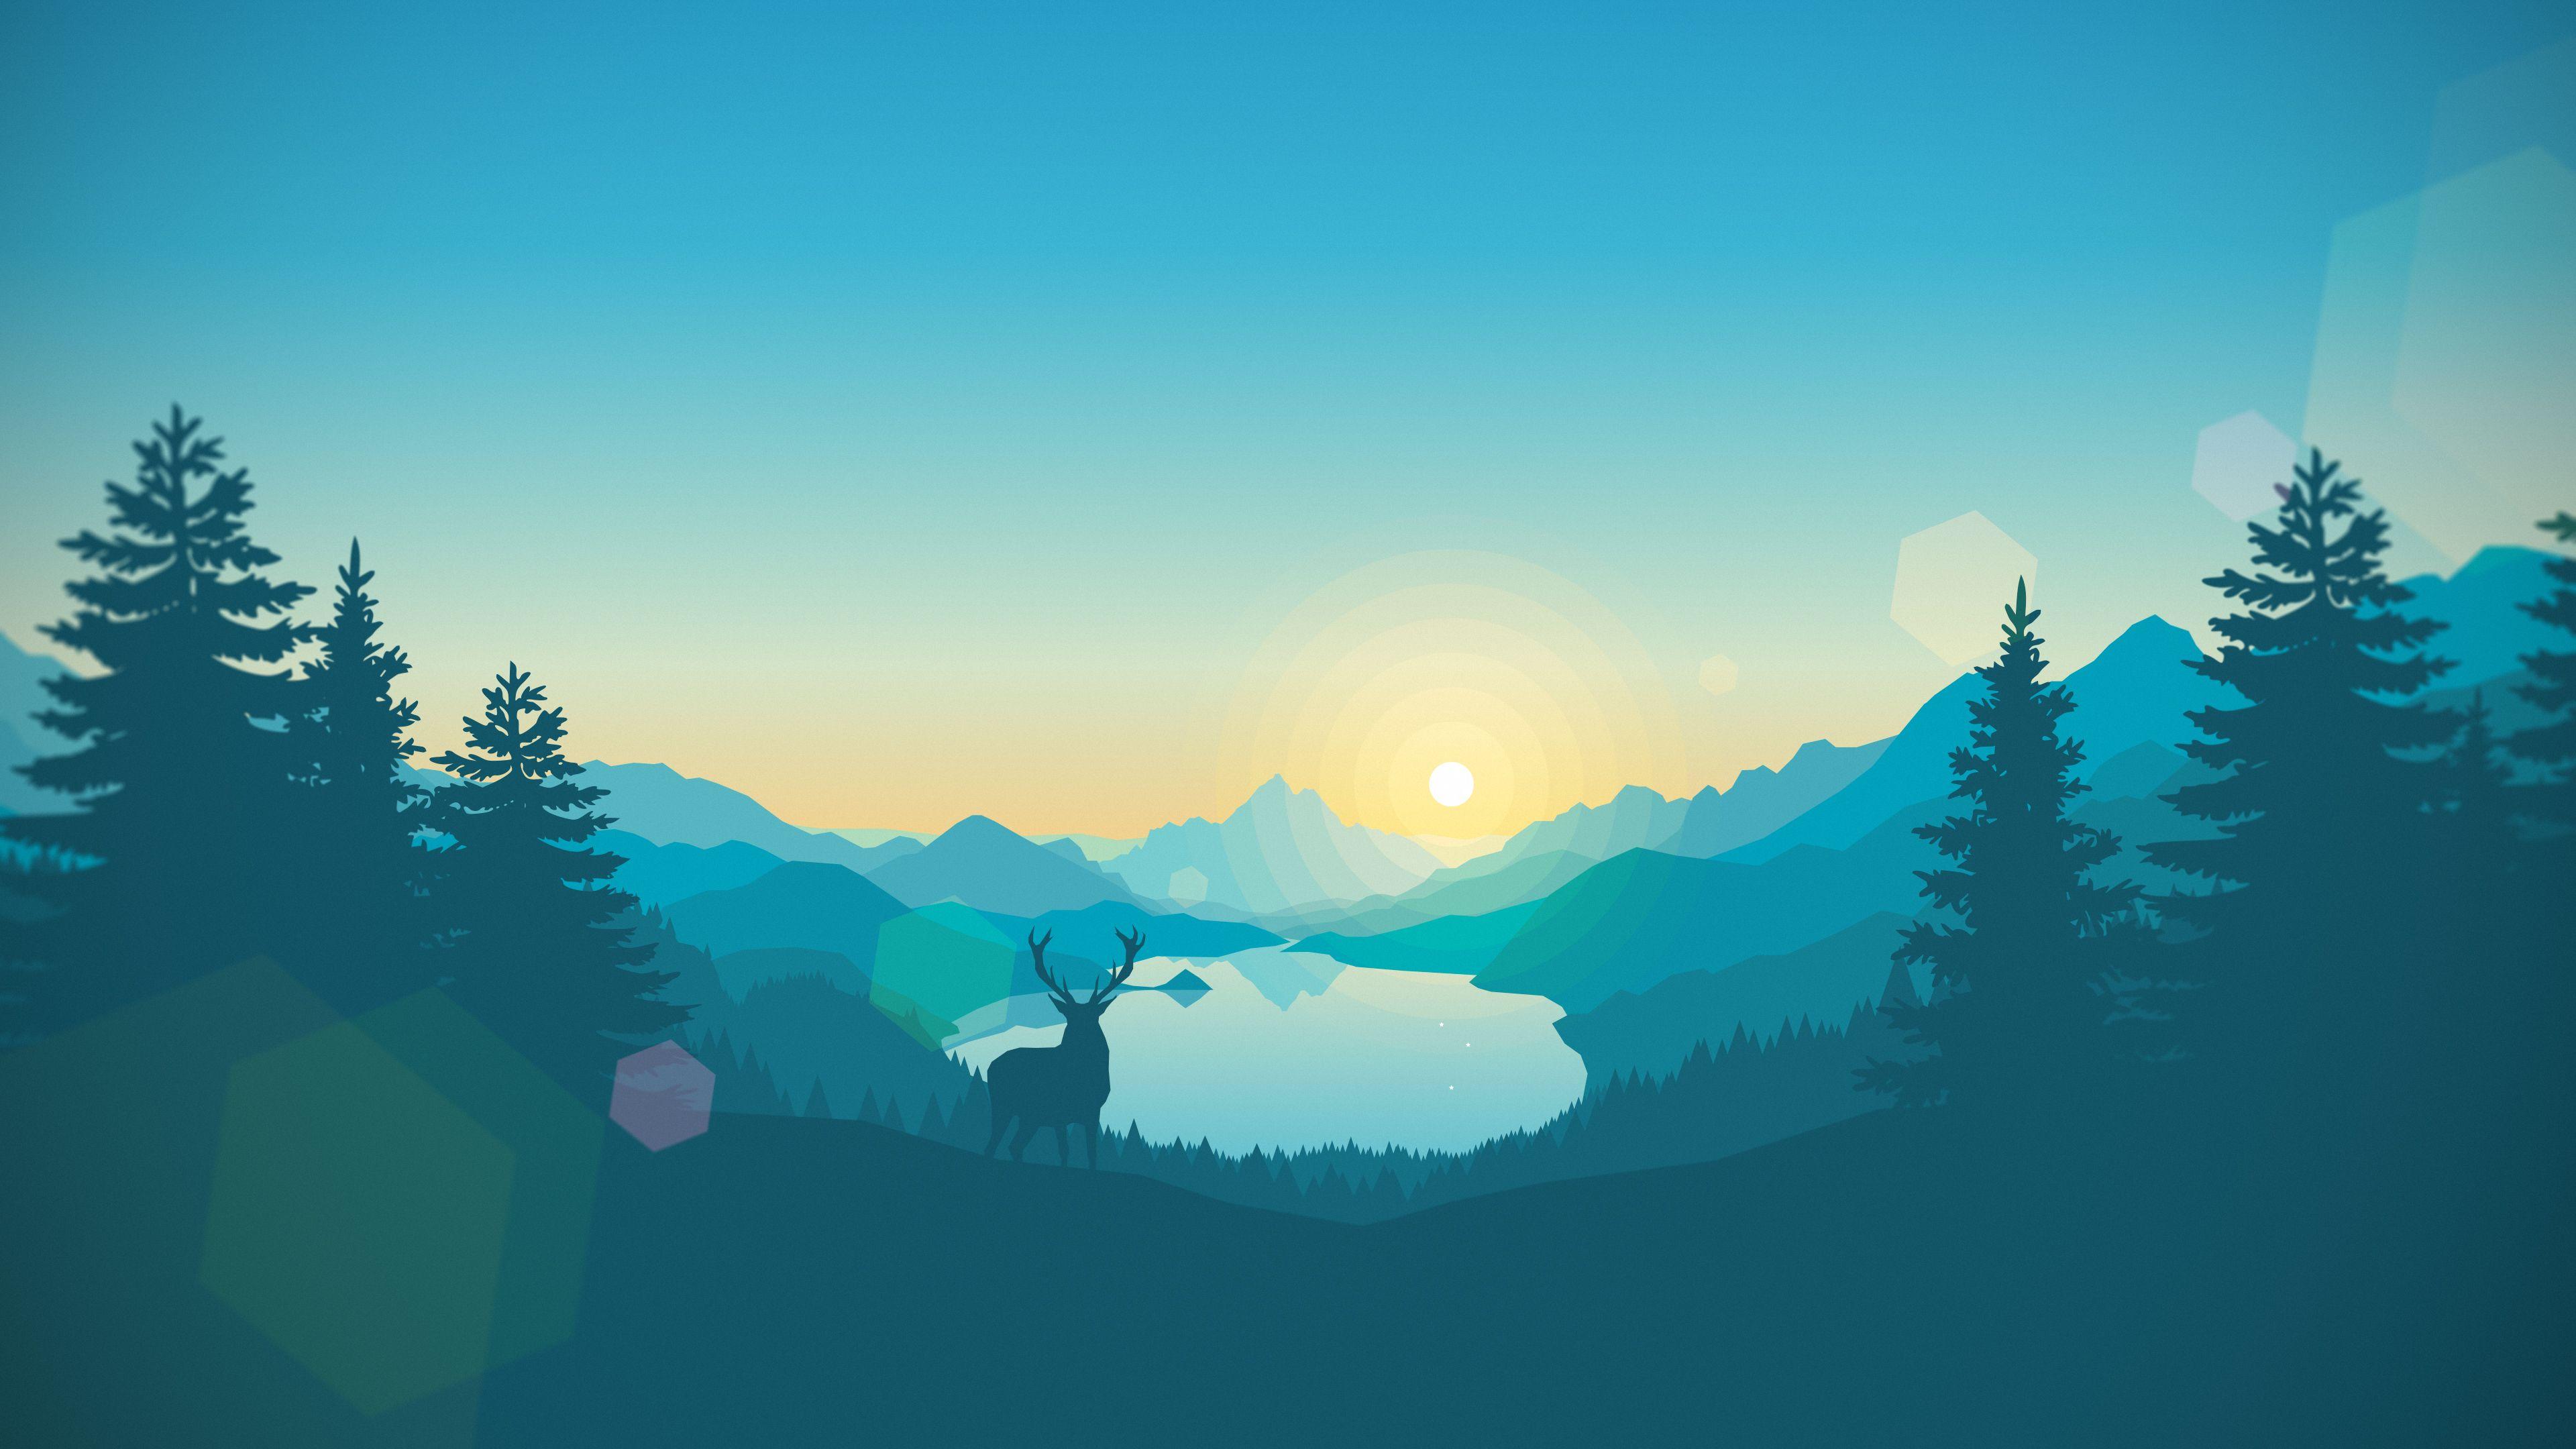 Pin by Jotta Onni on Vector illustration Deer wallpaper